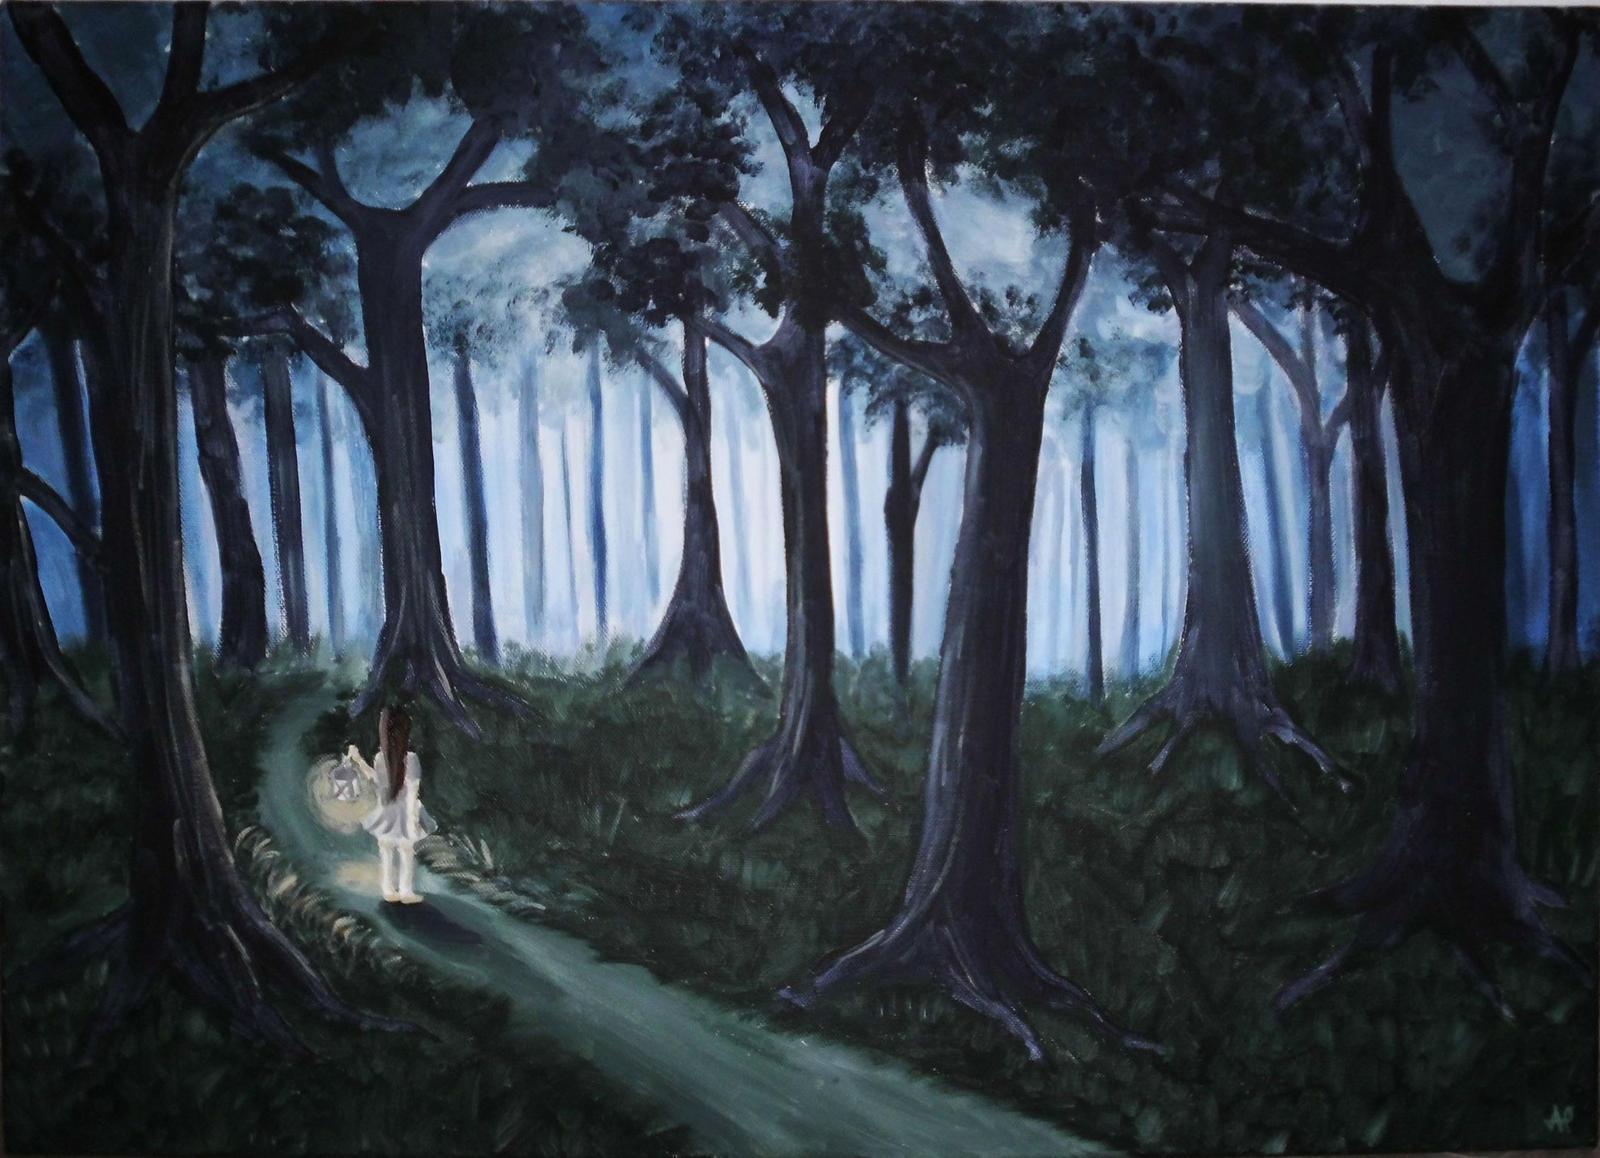 descriptive essay lost in the forest